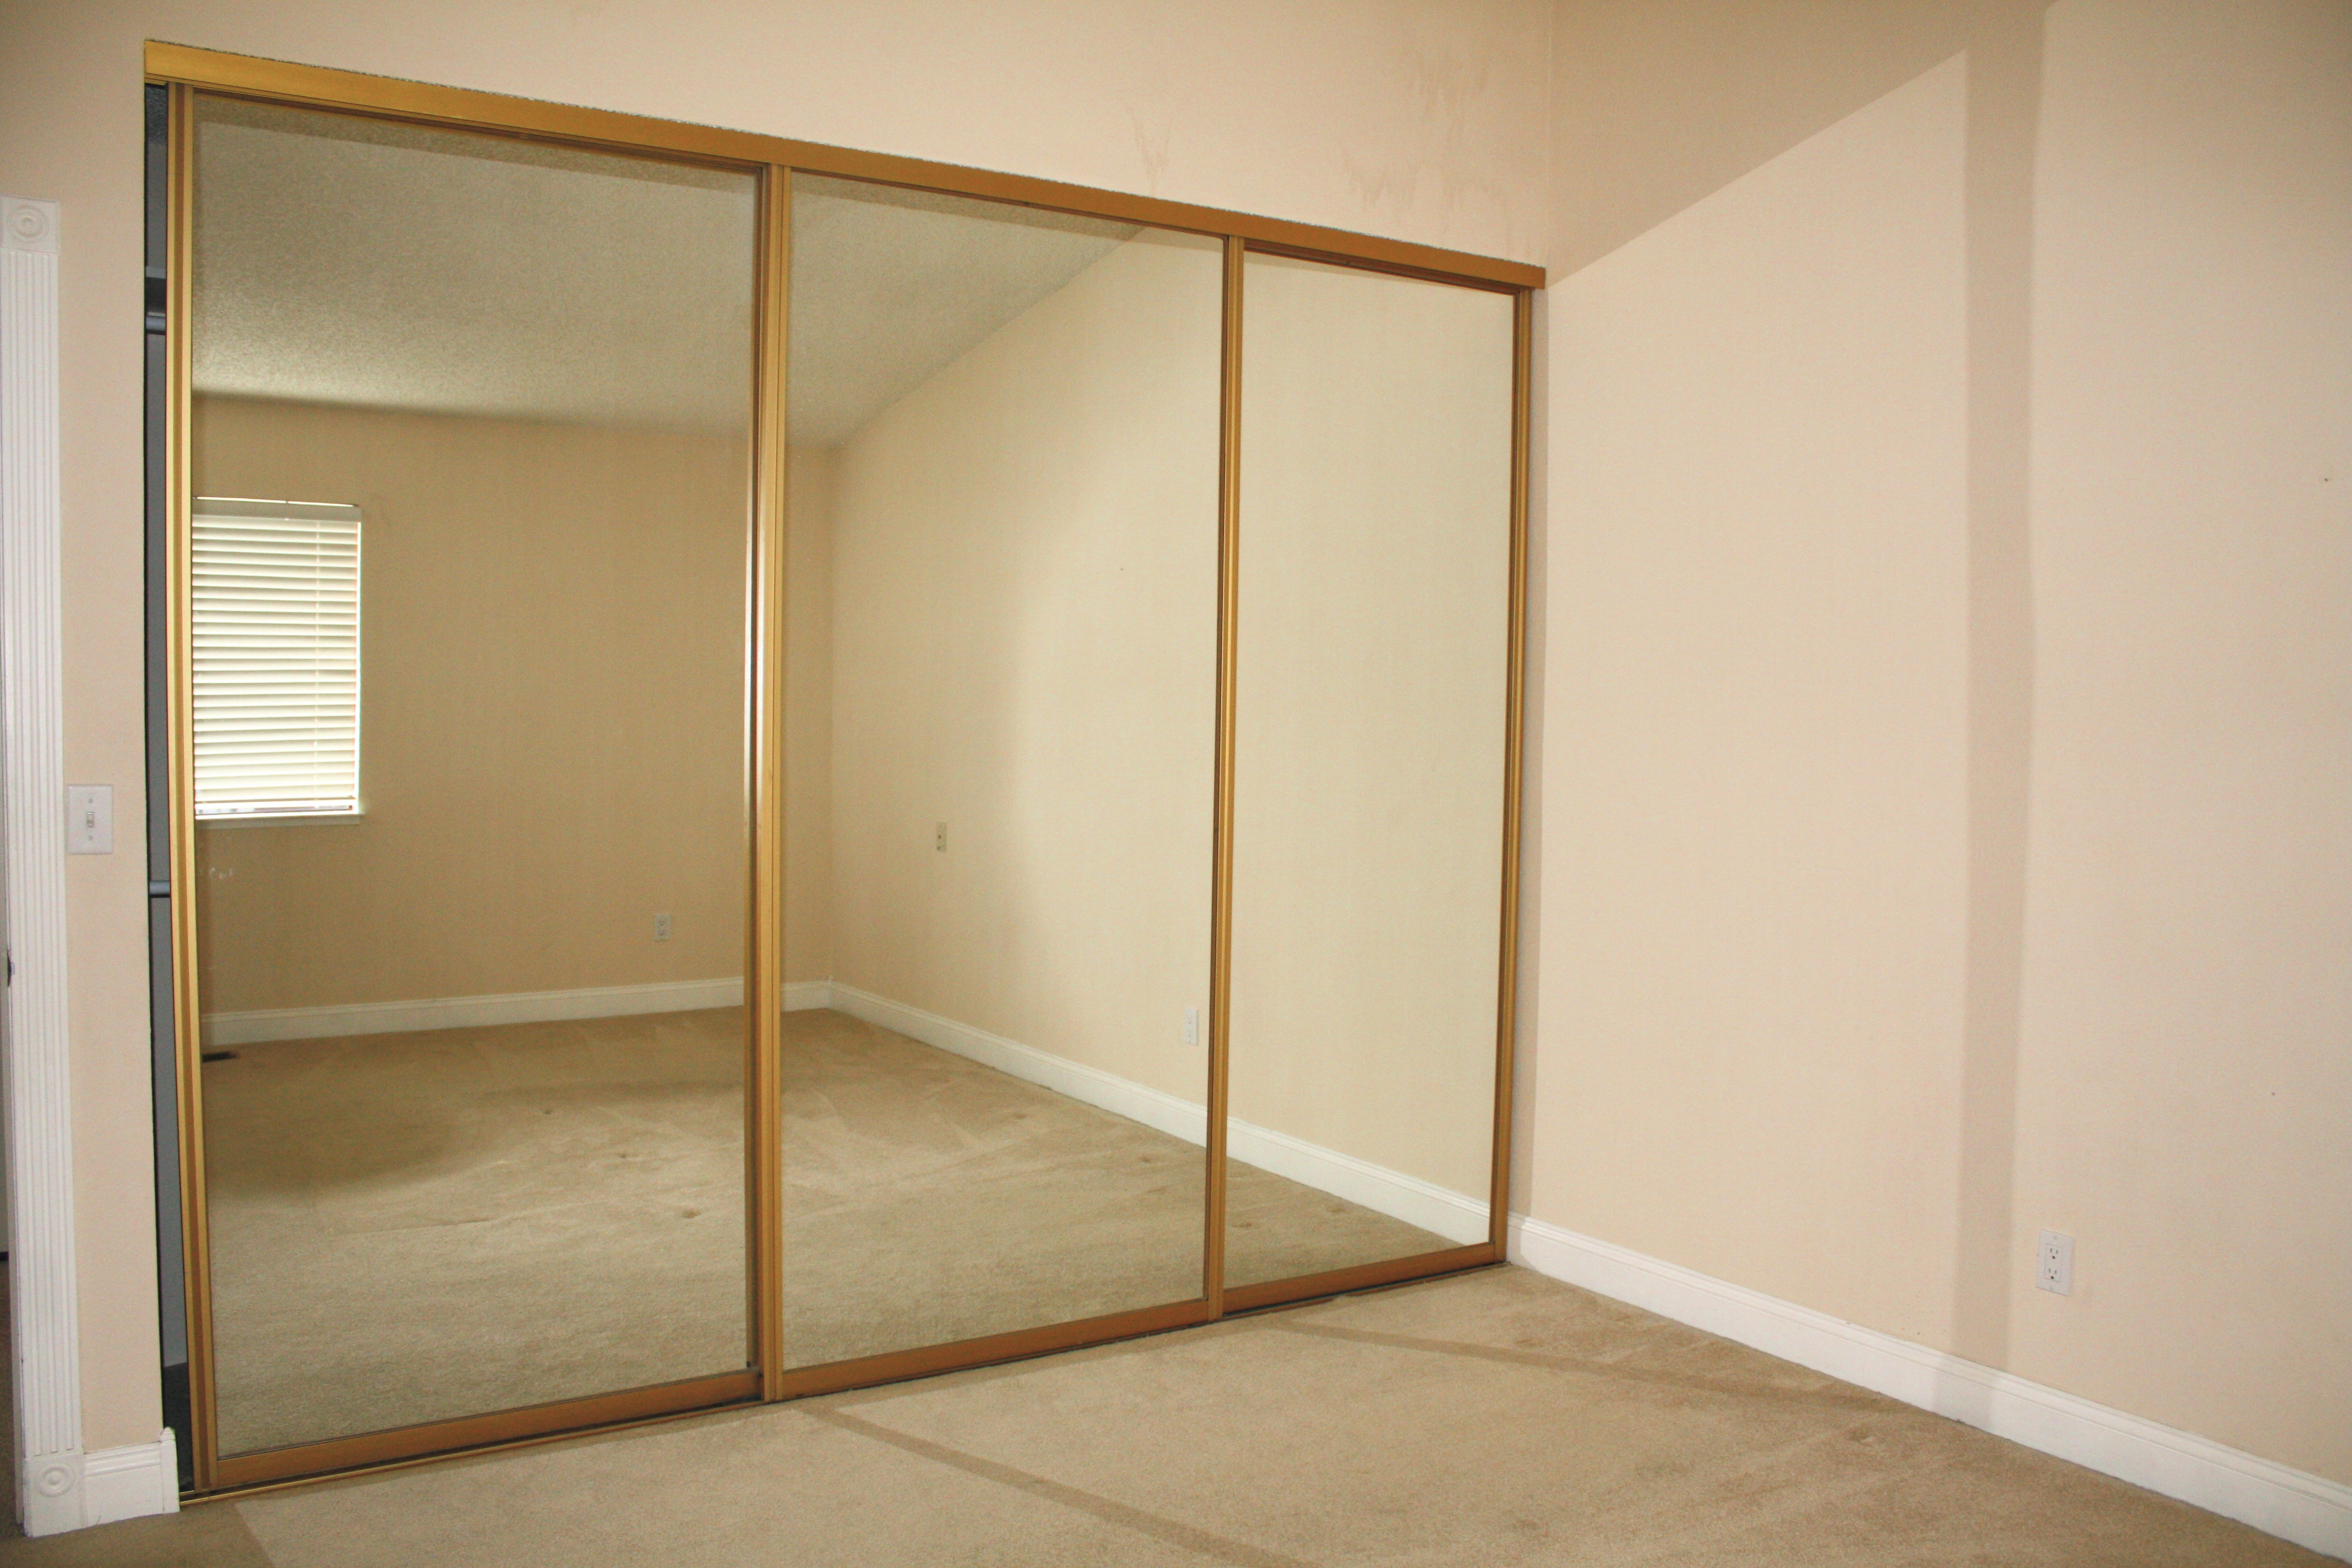 3 Panel Sliding Mirror Closet Doors3 Panel Sliding Mirror Closet Doors